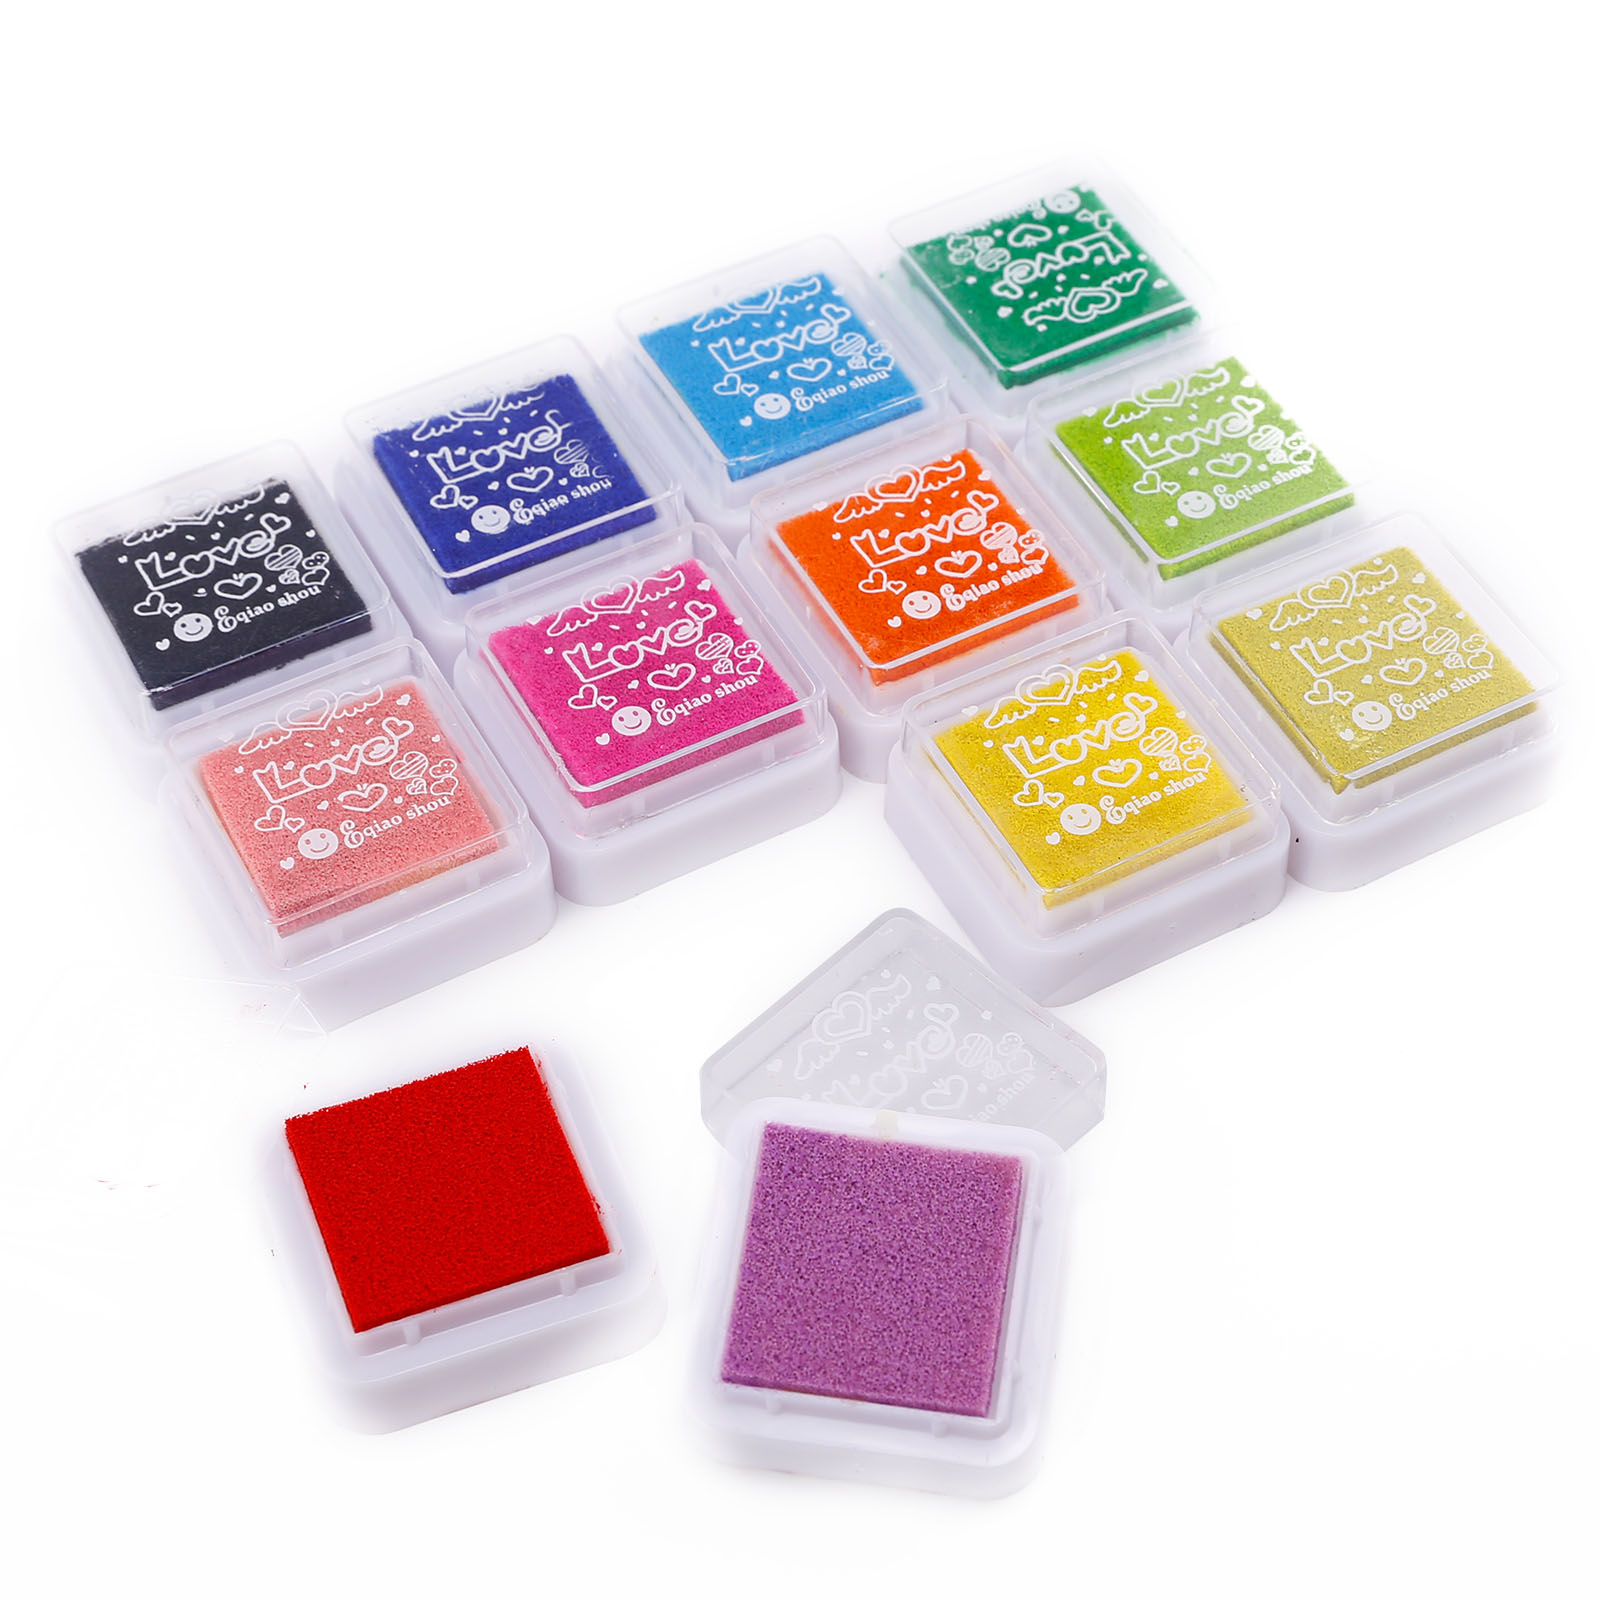 12 24 Colors Ink Pads Washable Fingerprint Stamp Inkpad DIY Scrapbooking